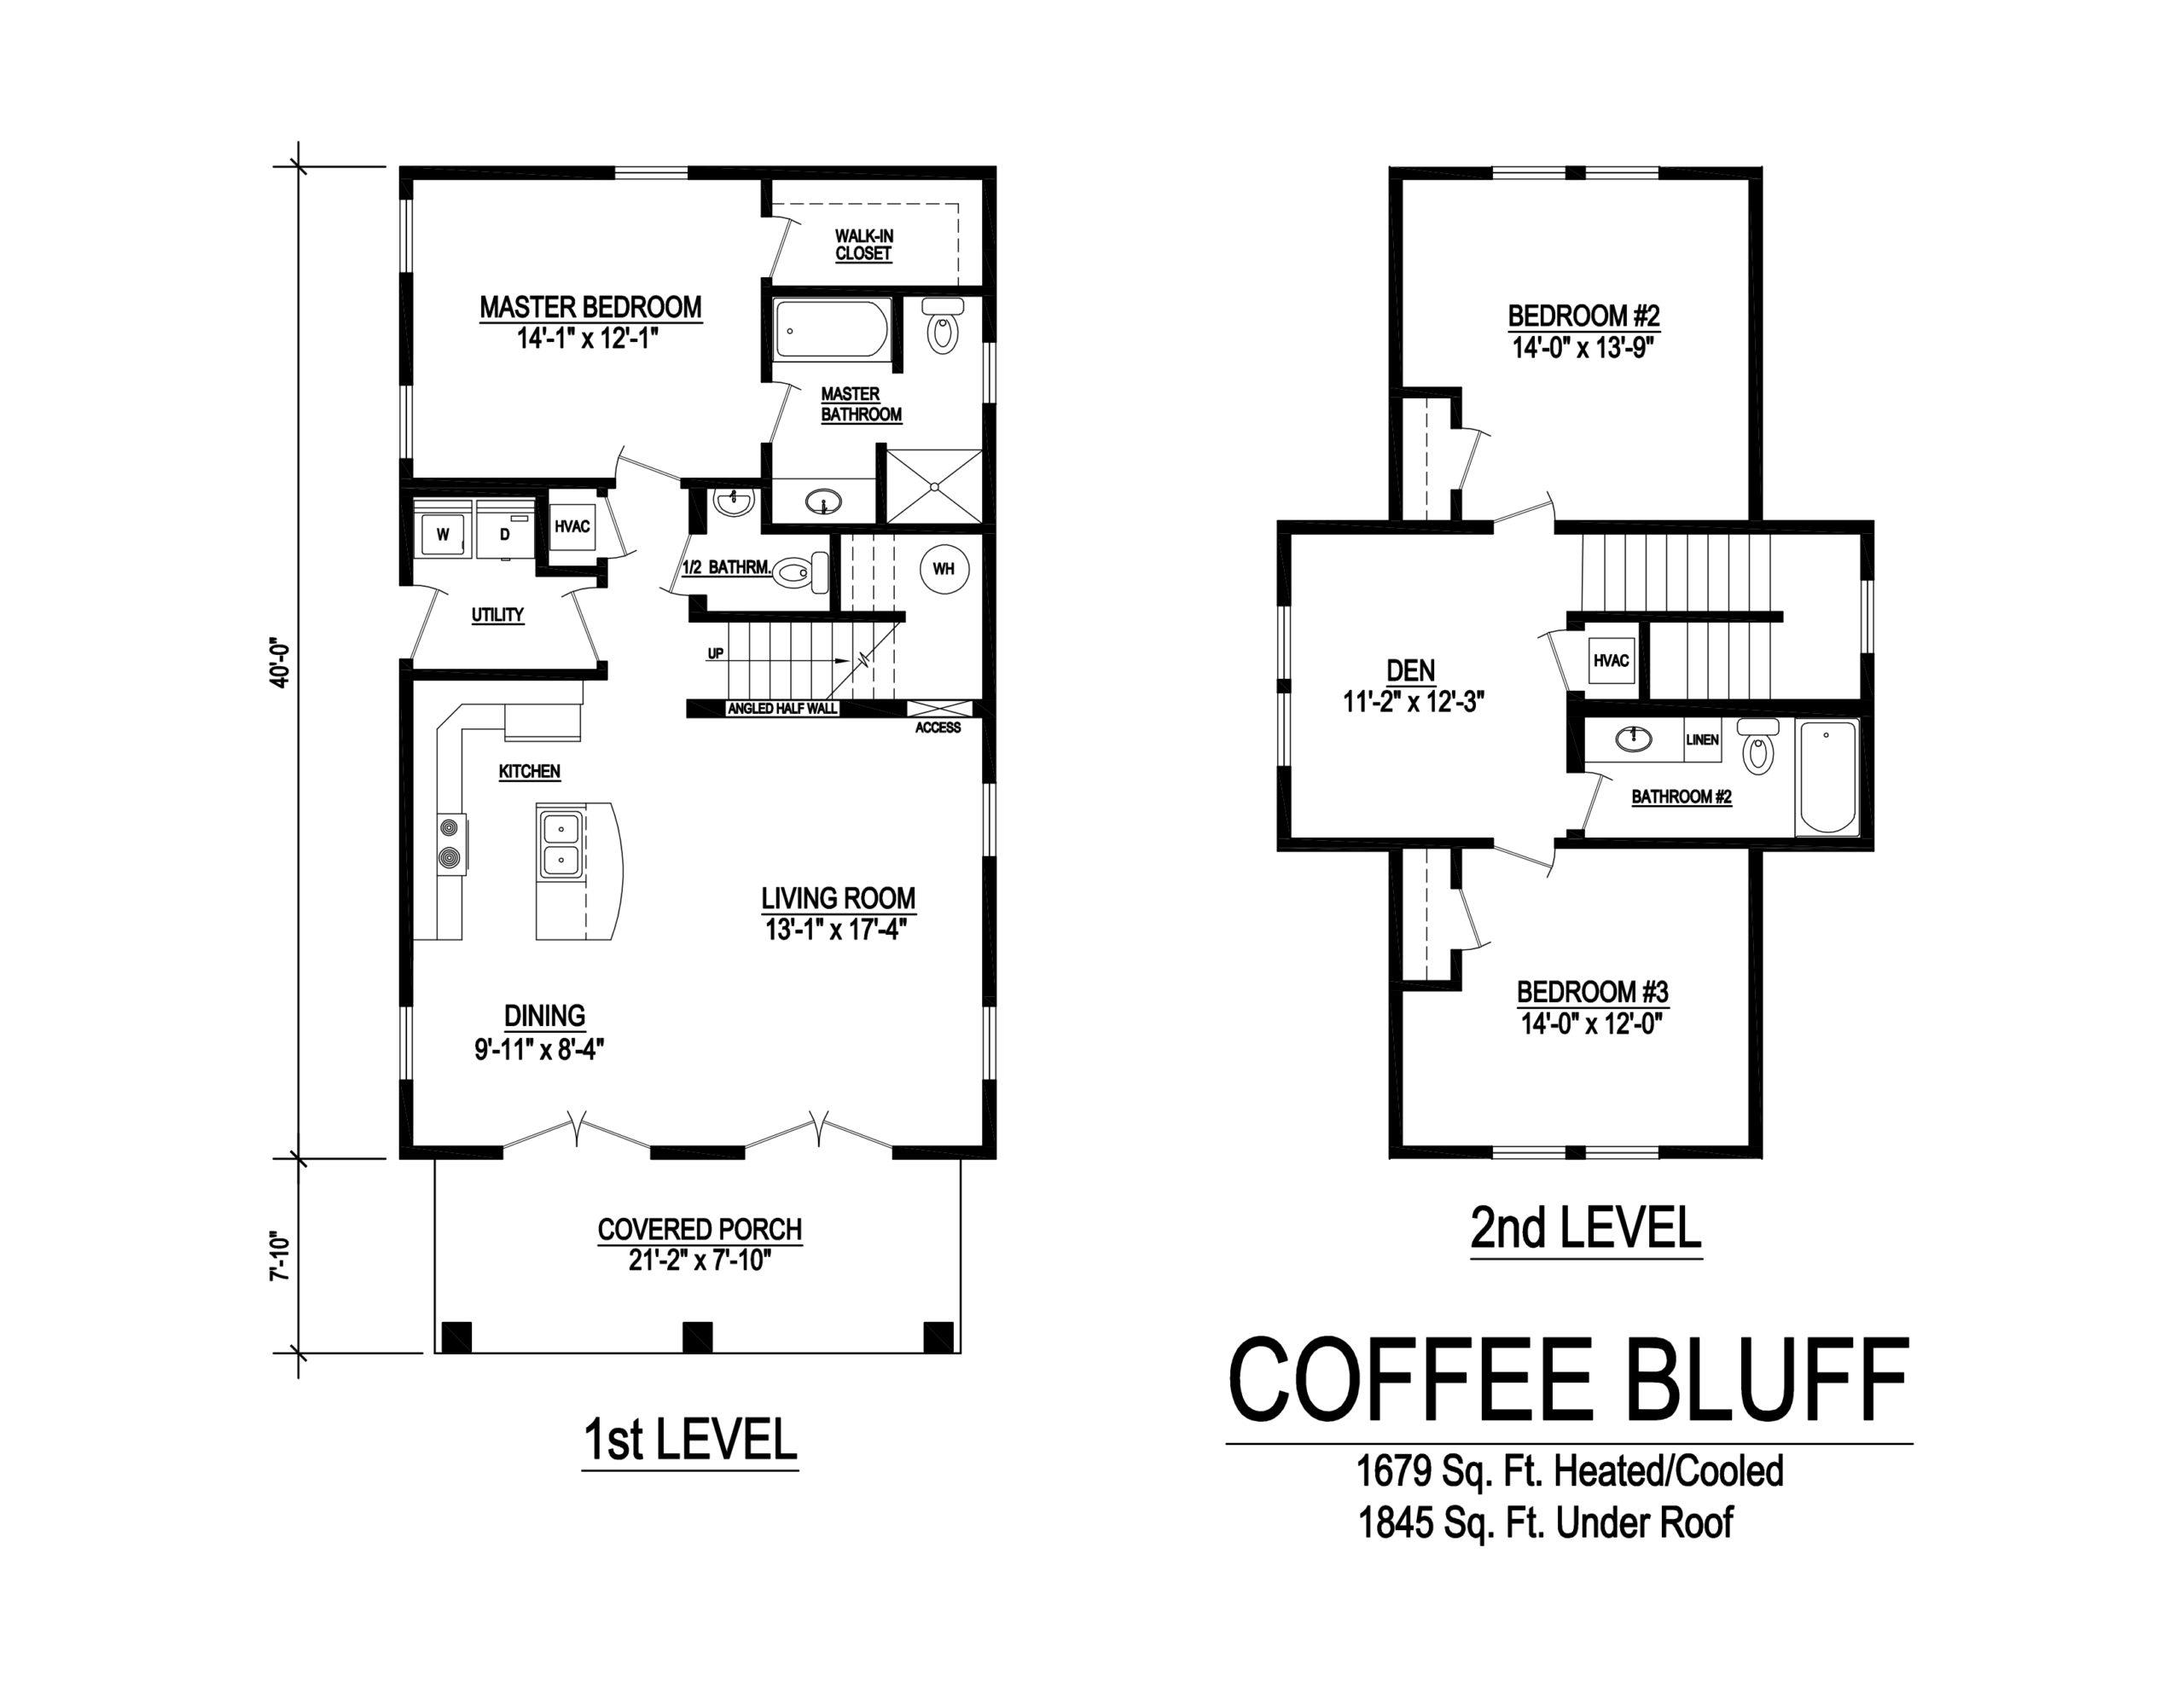 coffee bluff modular home floor plan